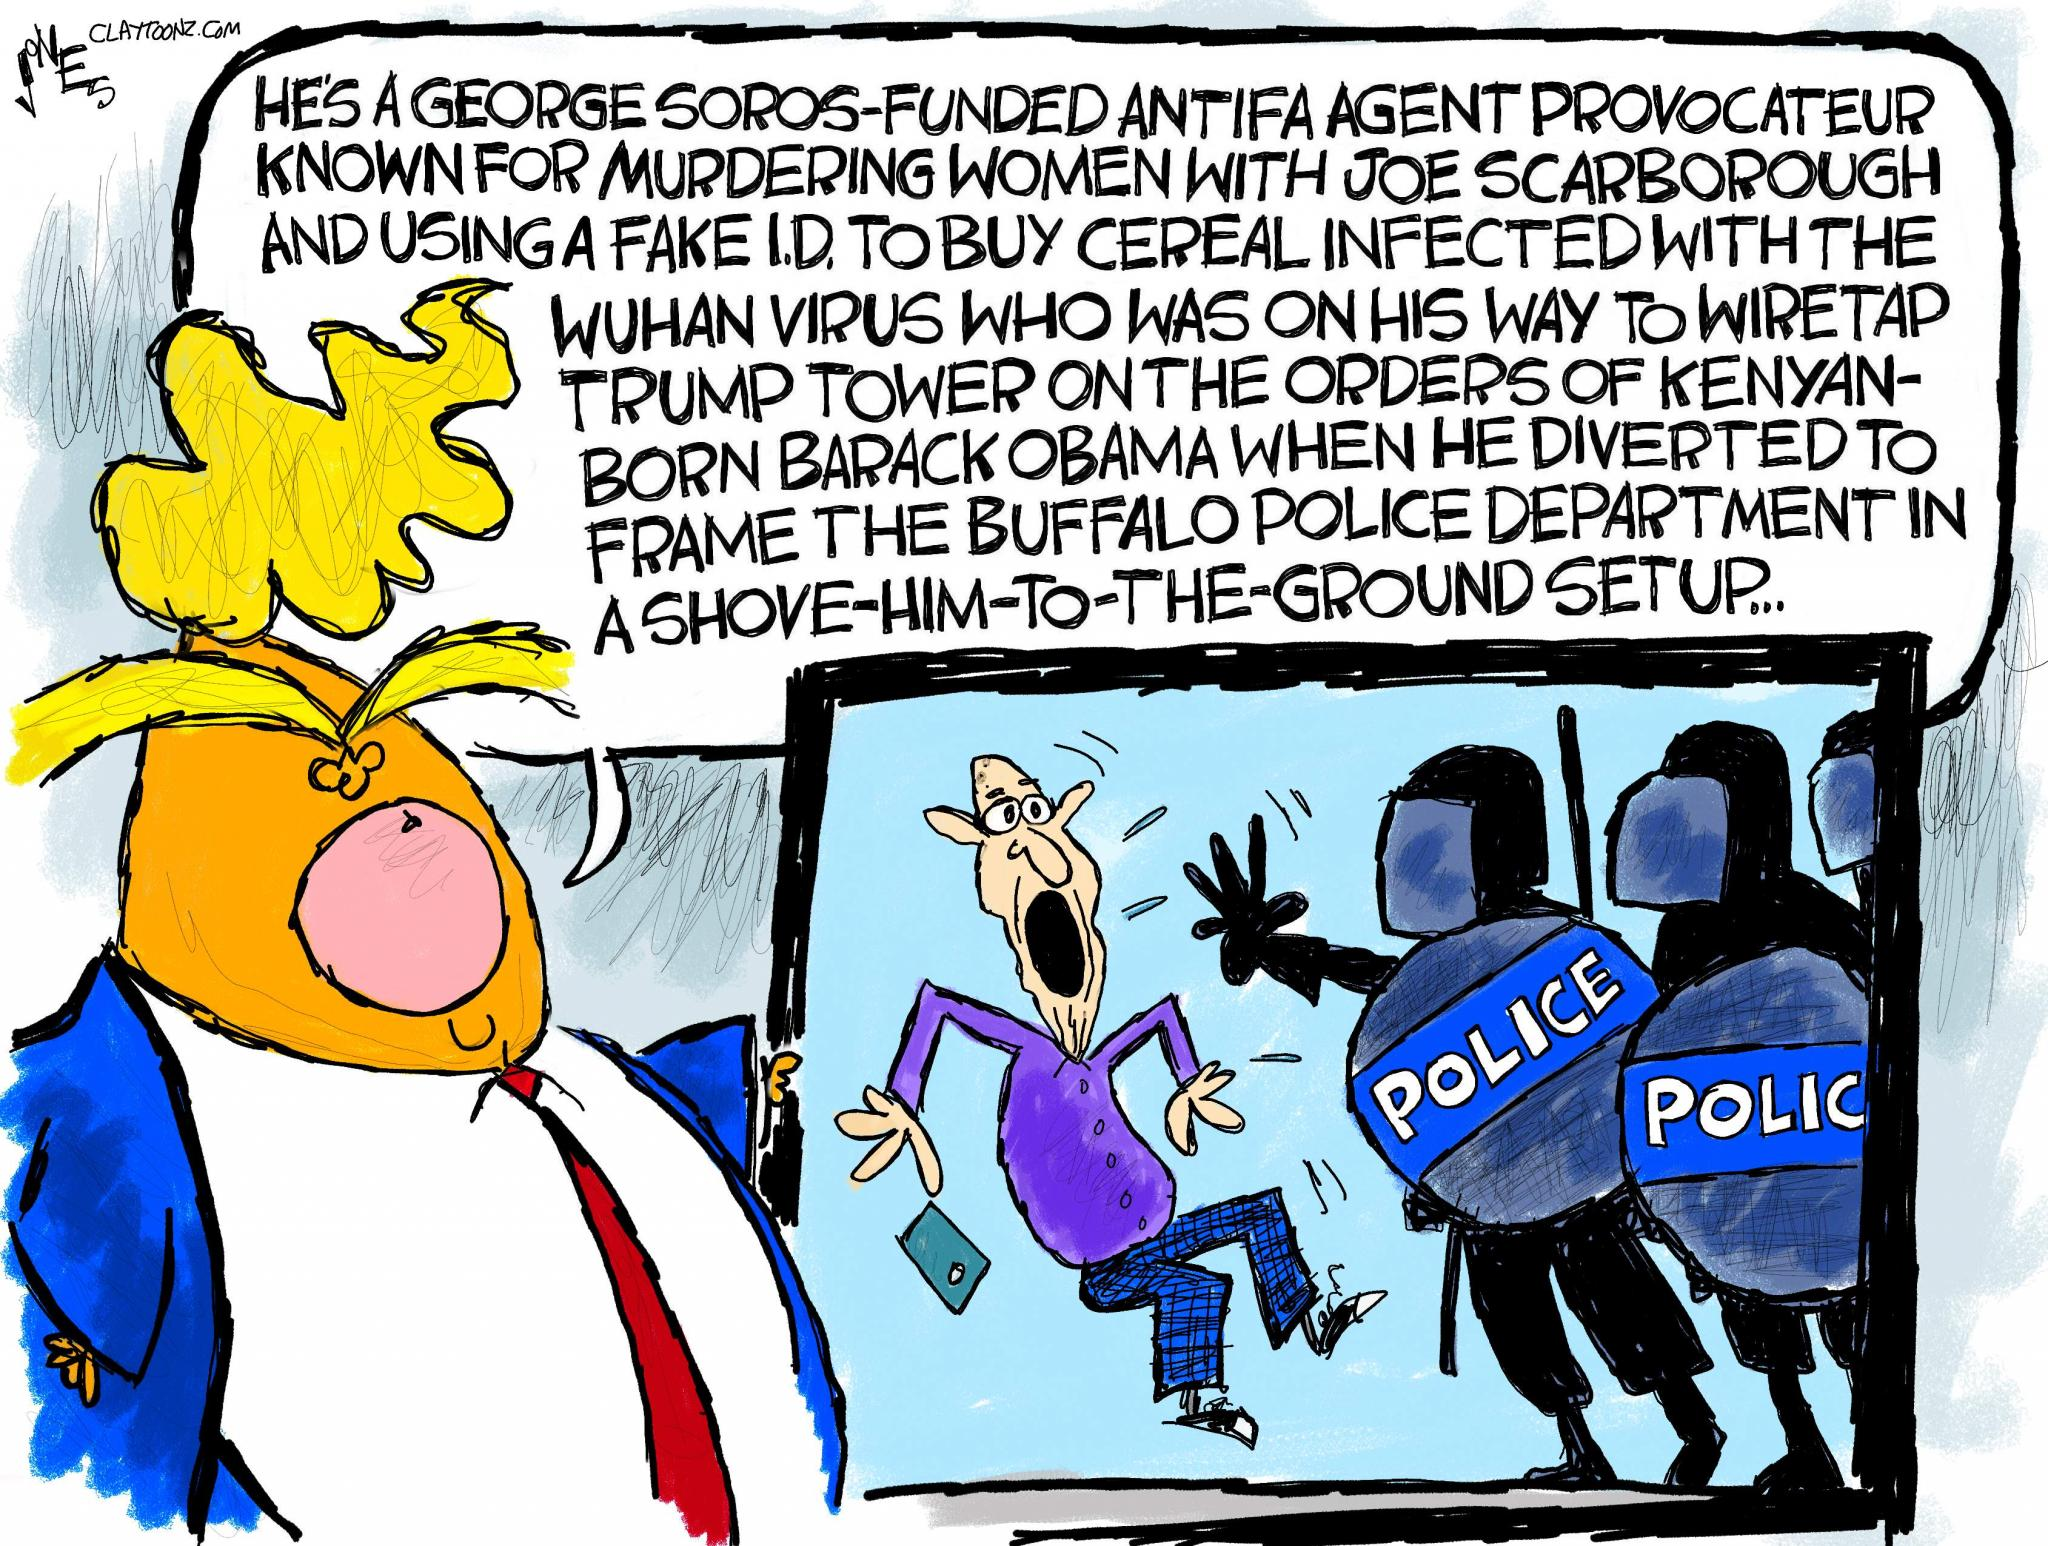 Political cartoons - the 'funny' pics thread.-cjones06122020-jpg